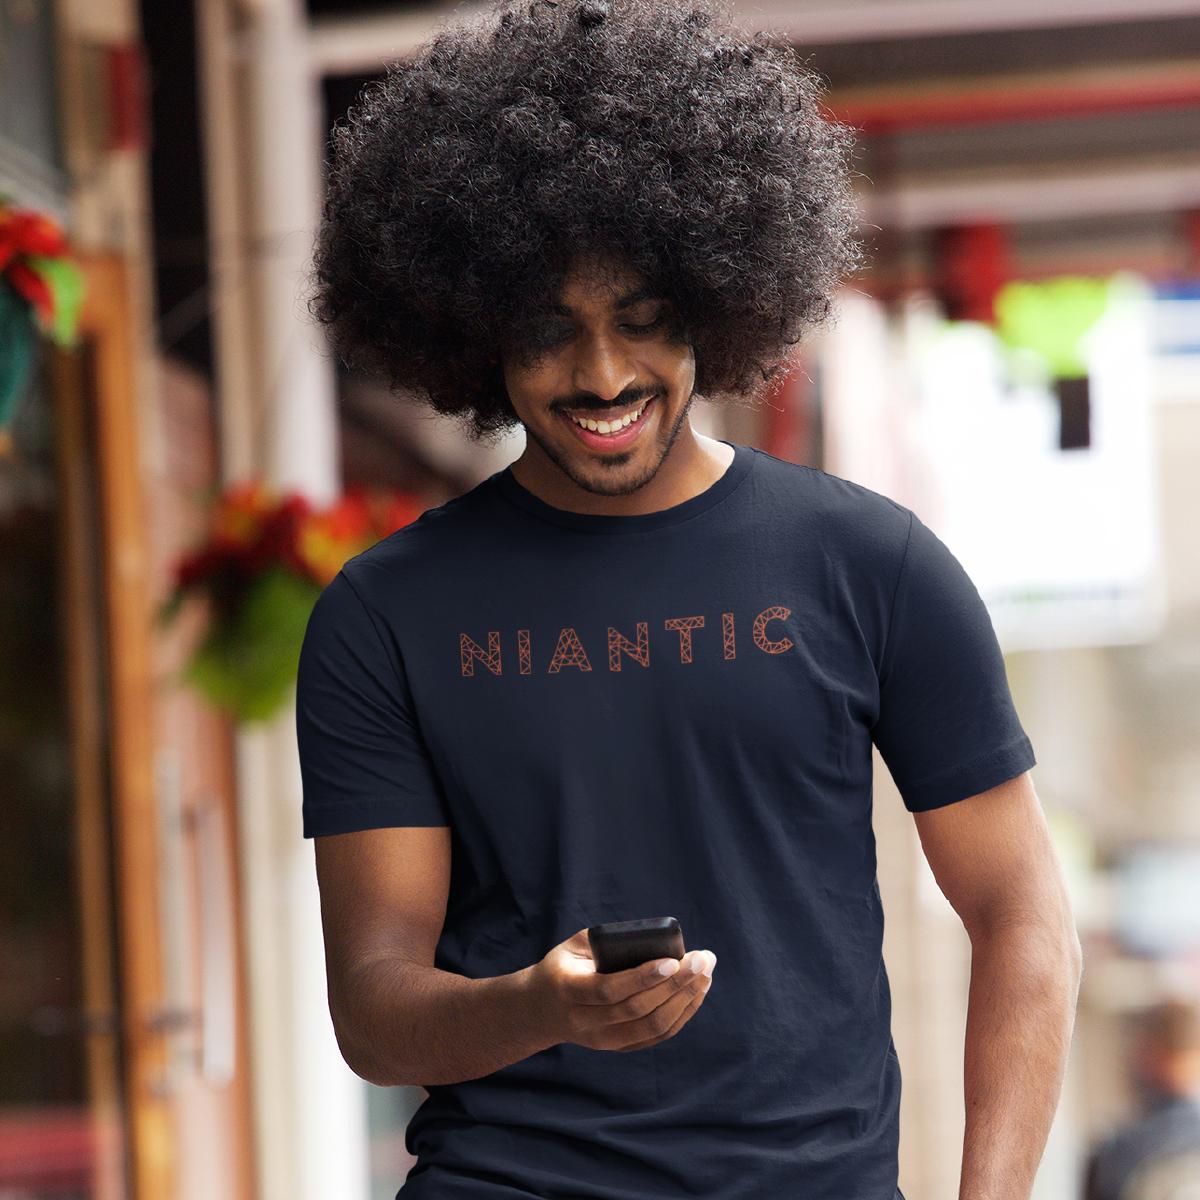 Niantic Fractal t-shirt